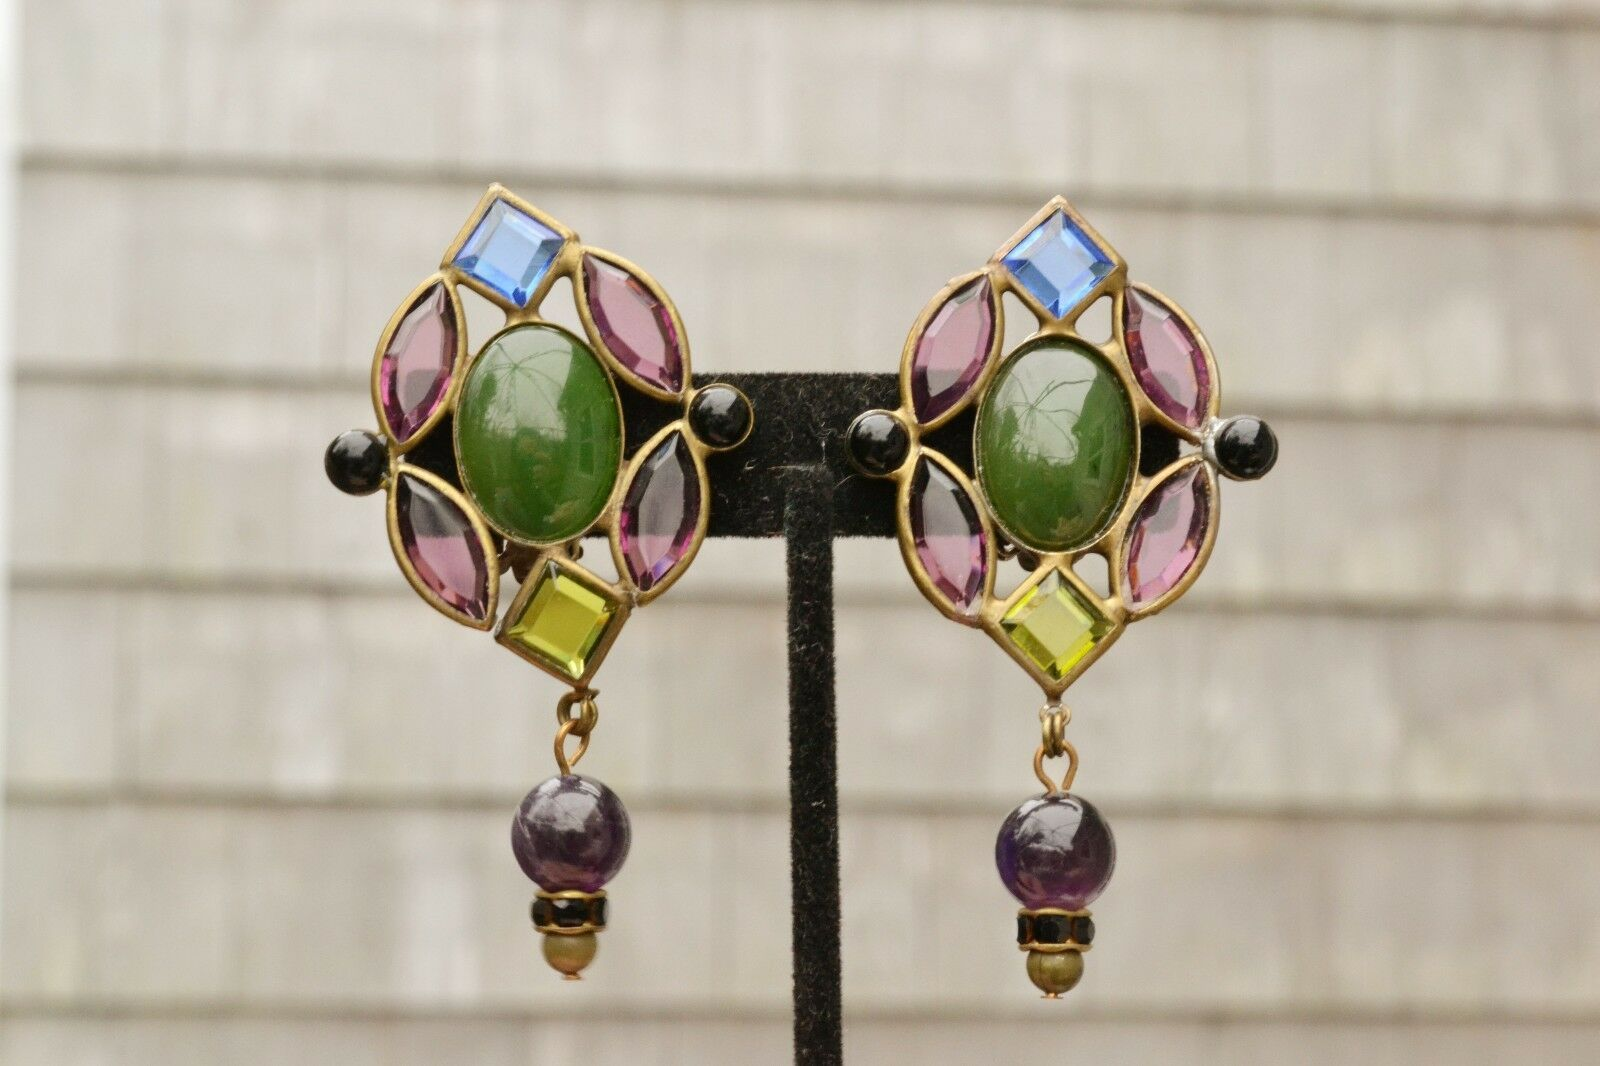 Vintage Sorelli clip earrings runway stained glass style bezel set open back big